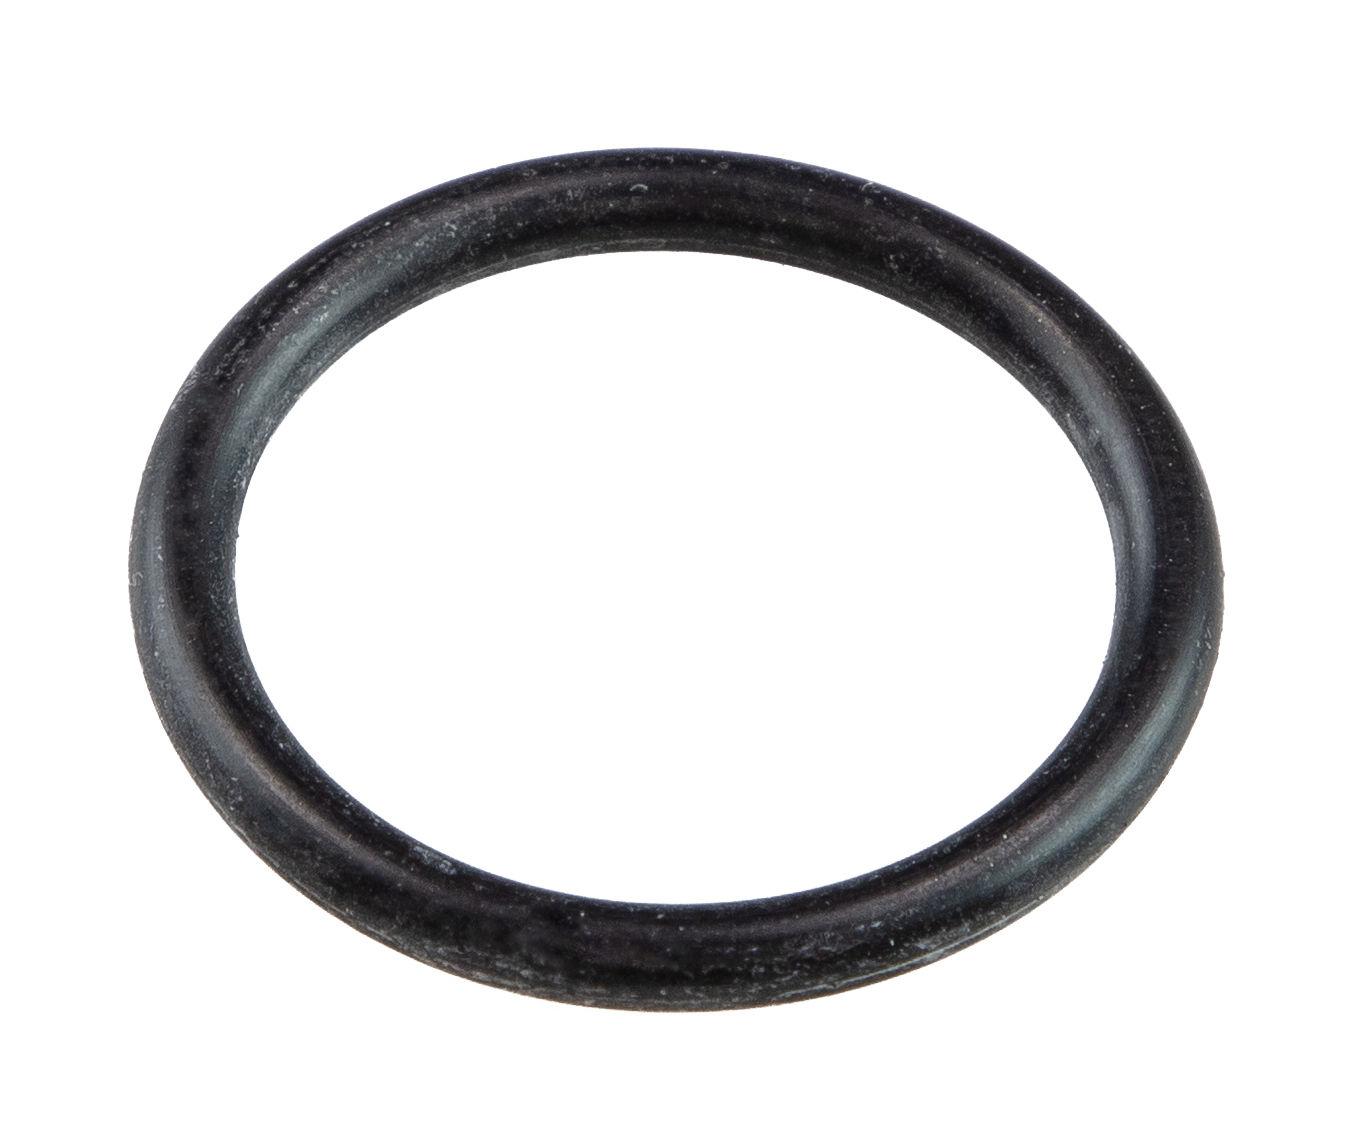 Ring O-ring Suzuki, D 24,5 0928024003000